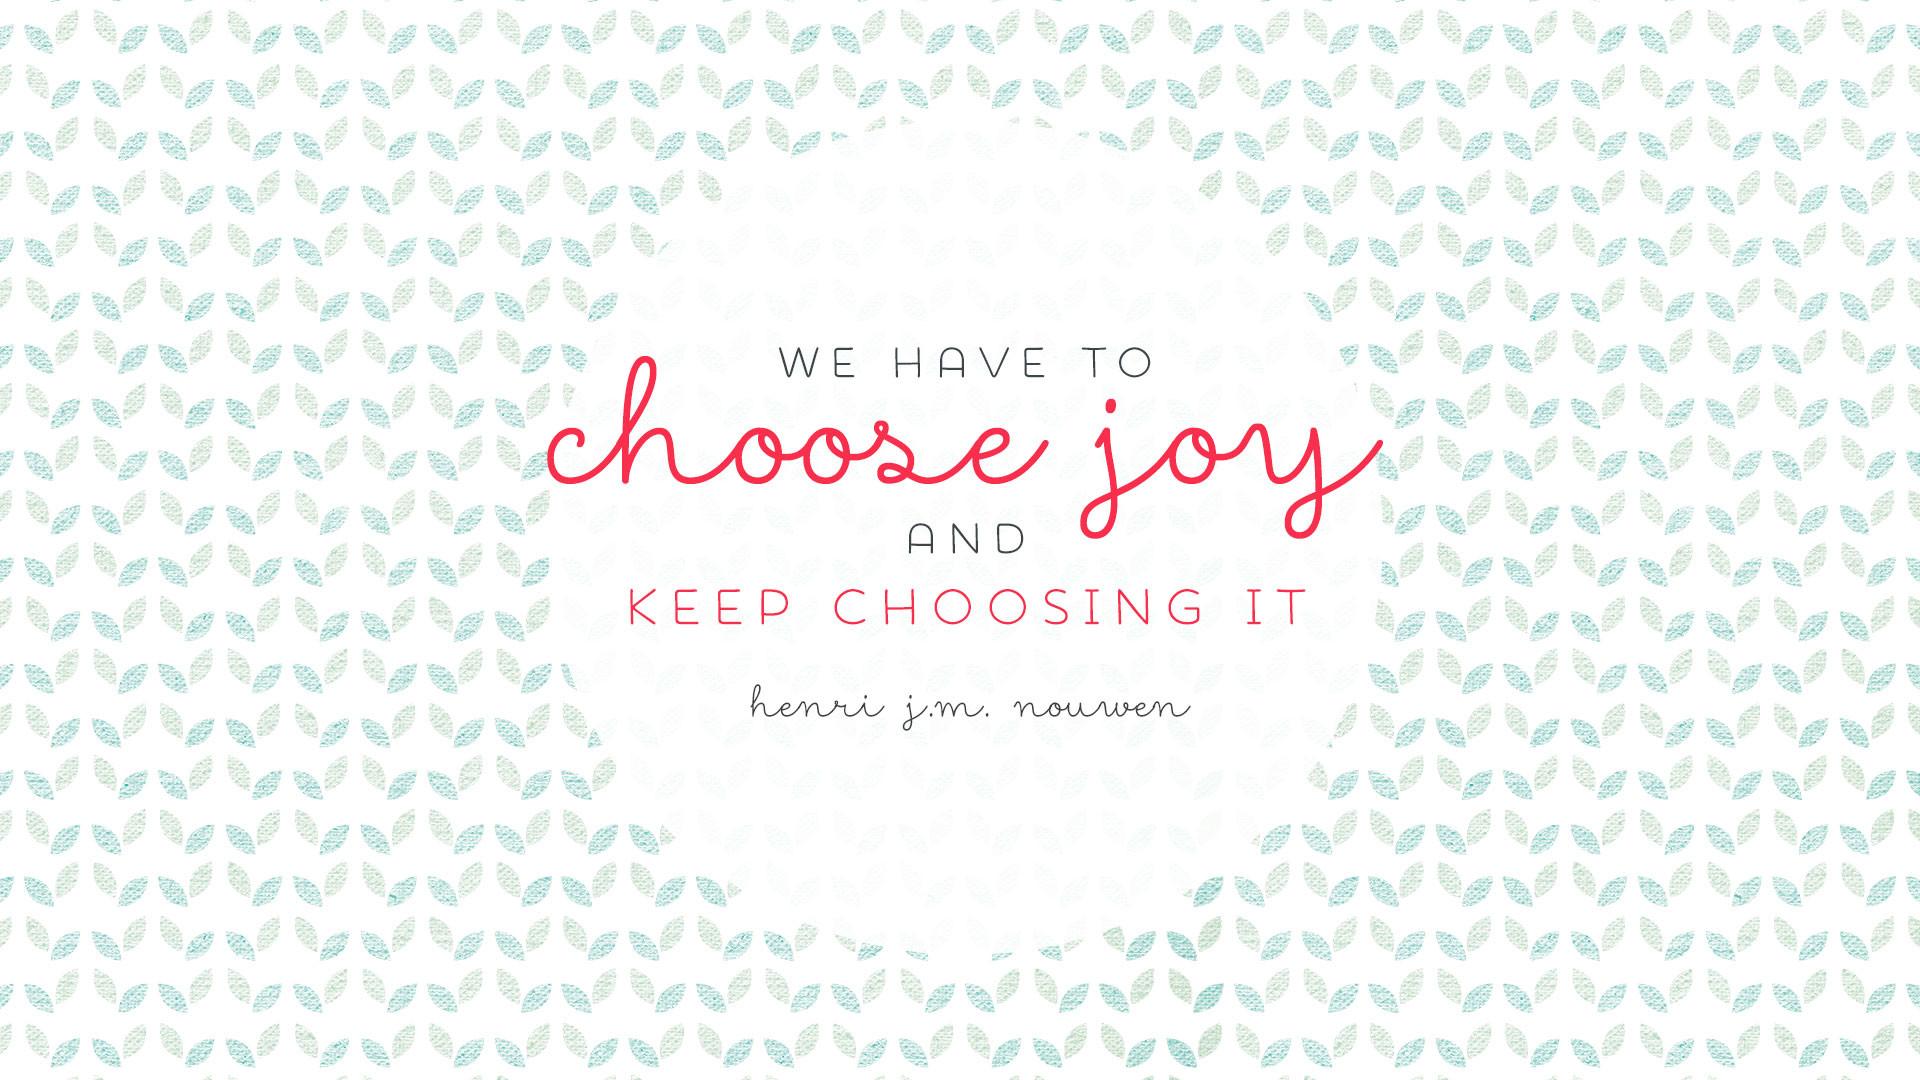 Mint pattern pink Choose Joy quote desktop wallpaper background | Wallpaper  | Pinterest | Choose joy, Joy quotes and Wallpaper backgrounds